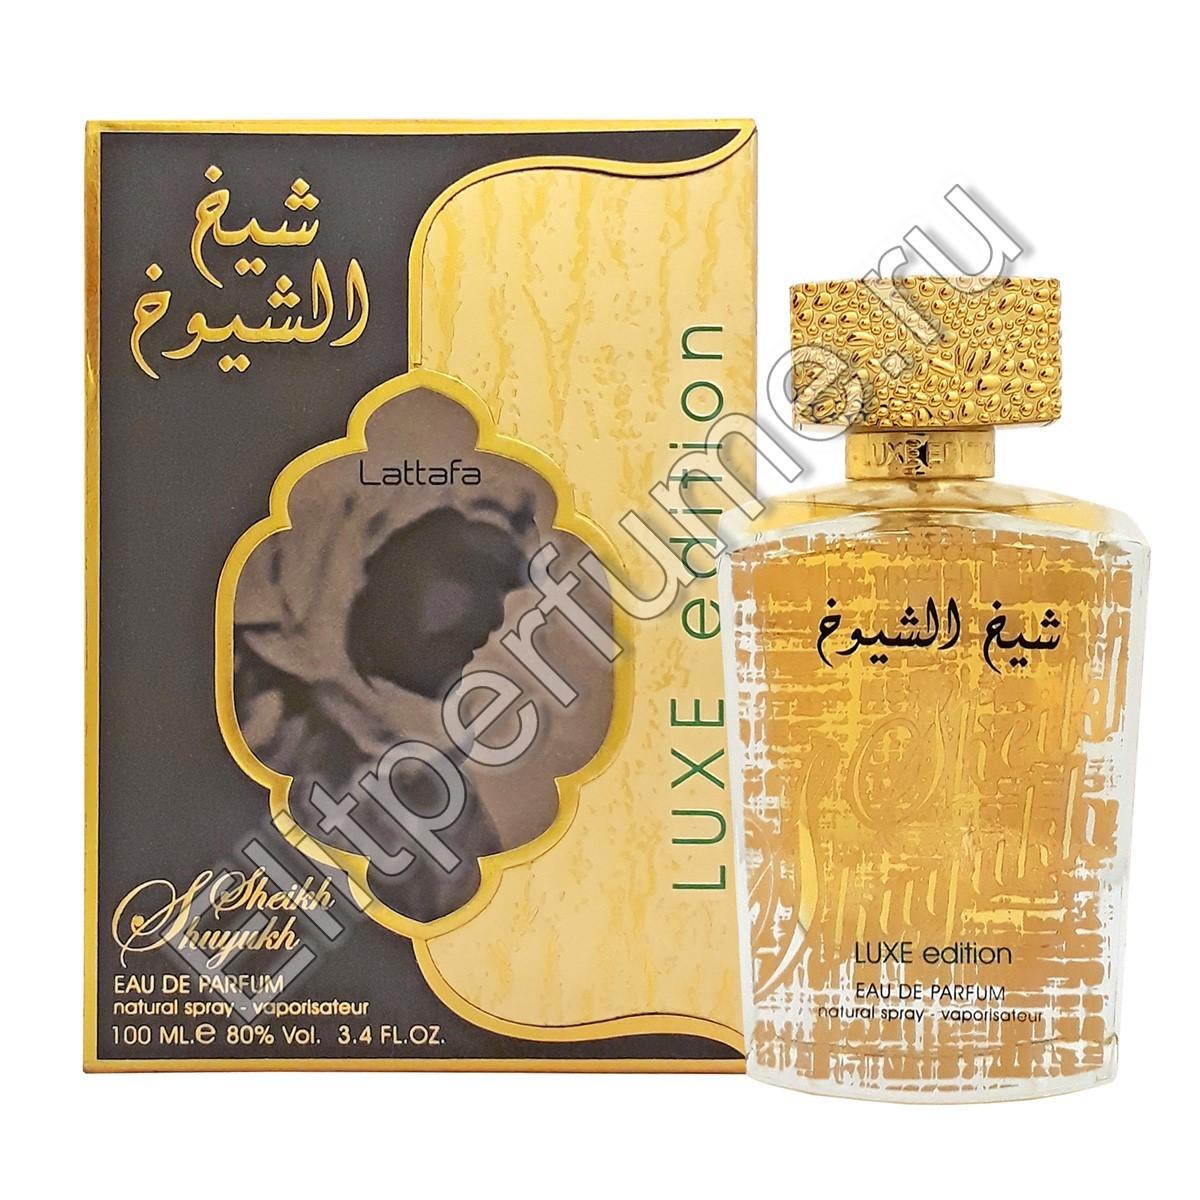 Sheikh Shuyukh Luxe Edition u EDP 100 мл спрей от Lattafa Латтафа